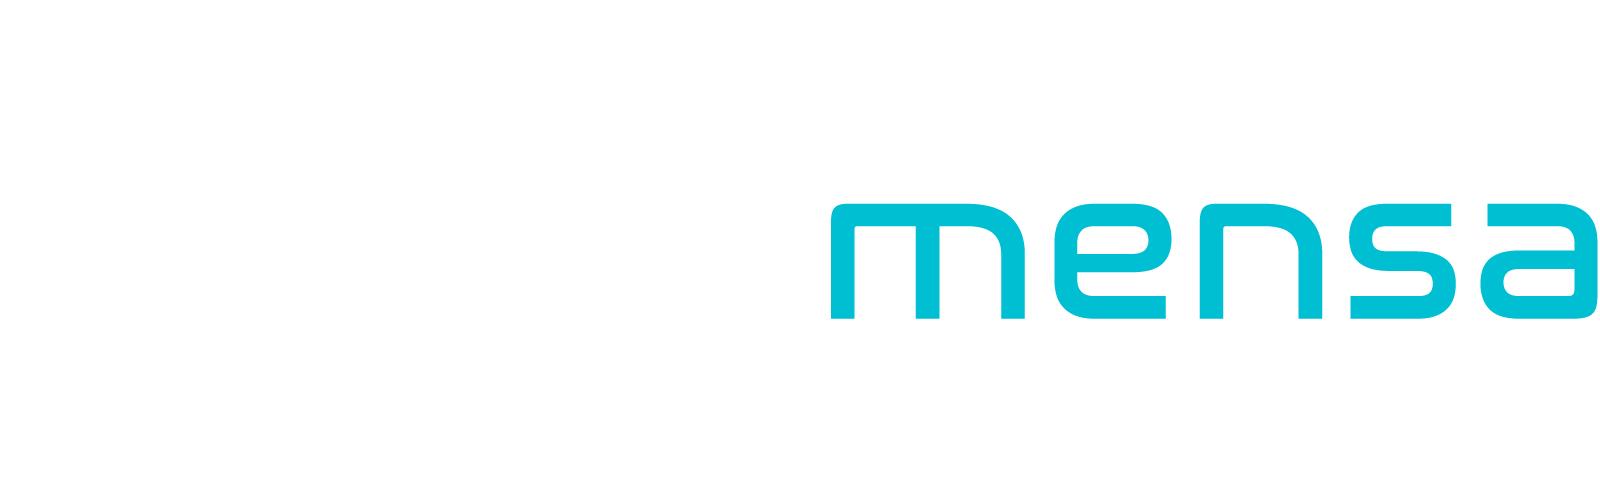 projektmensa Logo